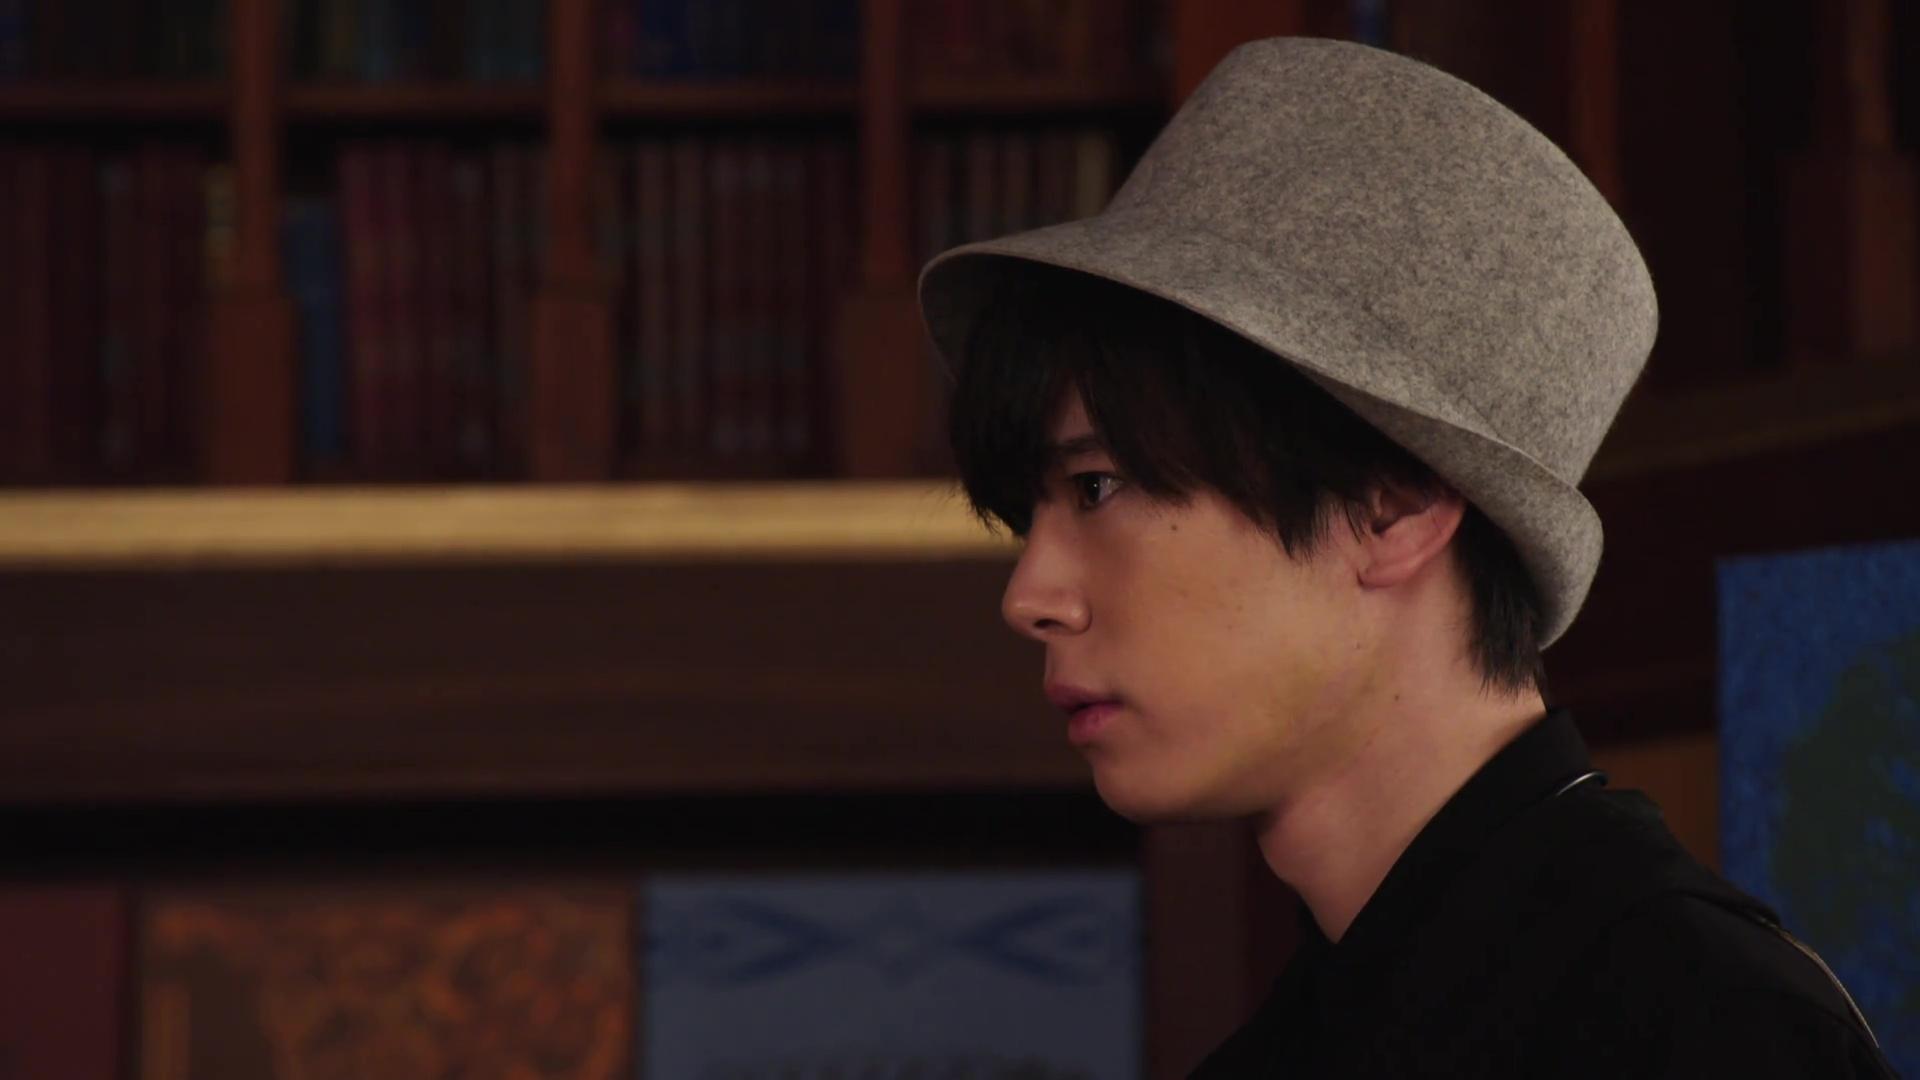 Kamen Rider Saber Episode 18 Recap